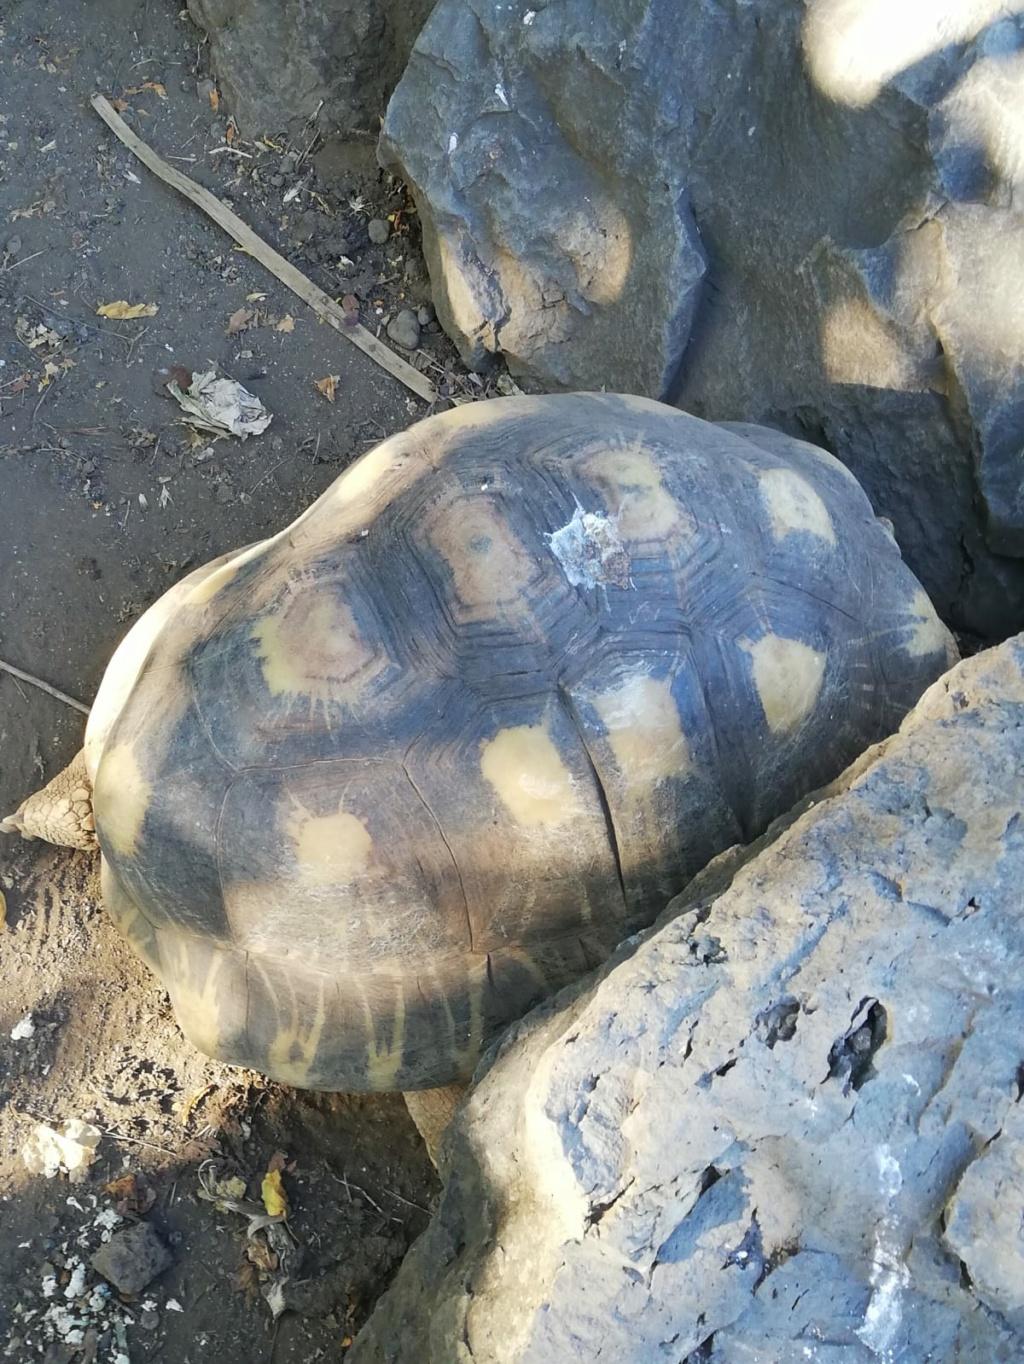 Identifications tortues radiées de Madagascar ? Img-2021